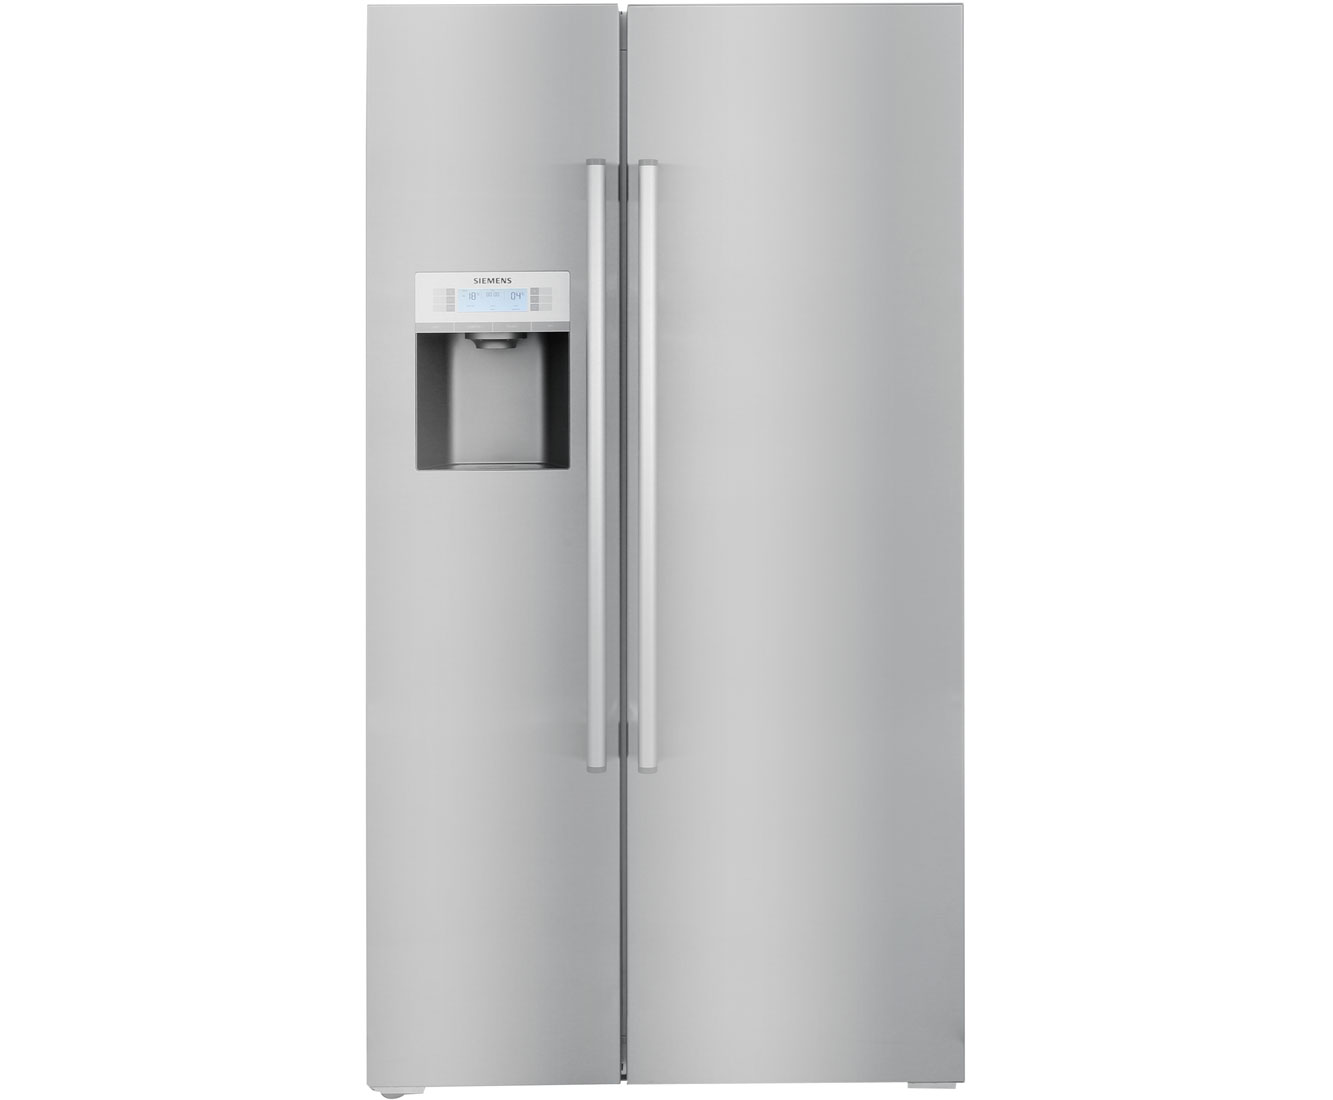 Smeg Kühlschrank Ulm : Kühlschrank liegend transportieren sammelbestellung panasonic